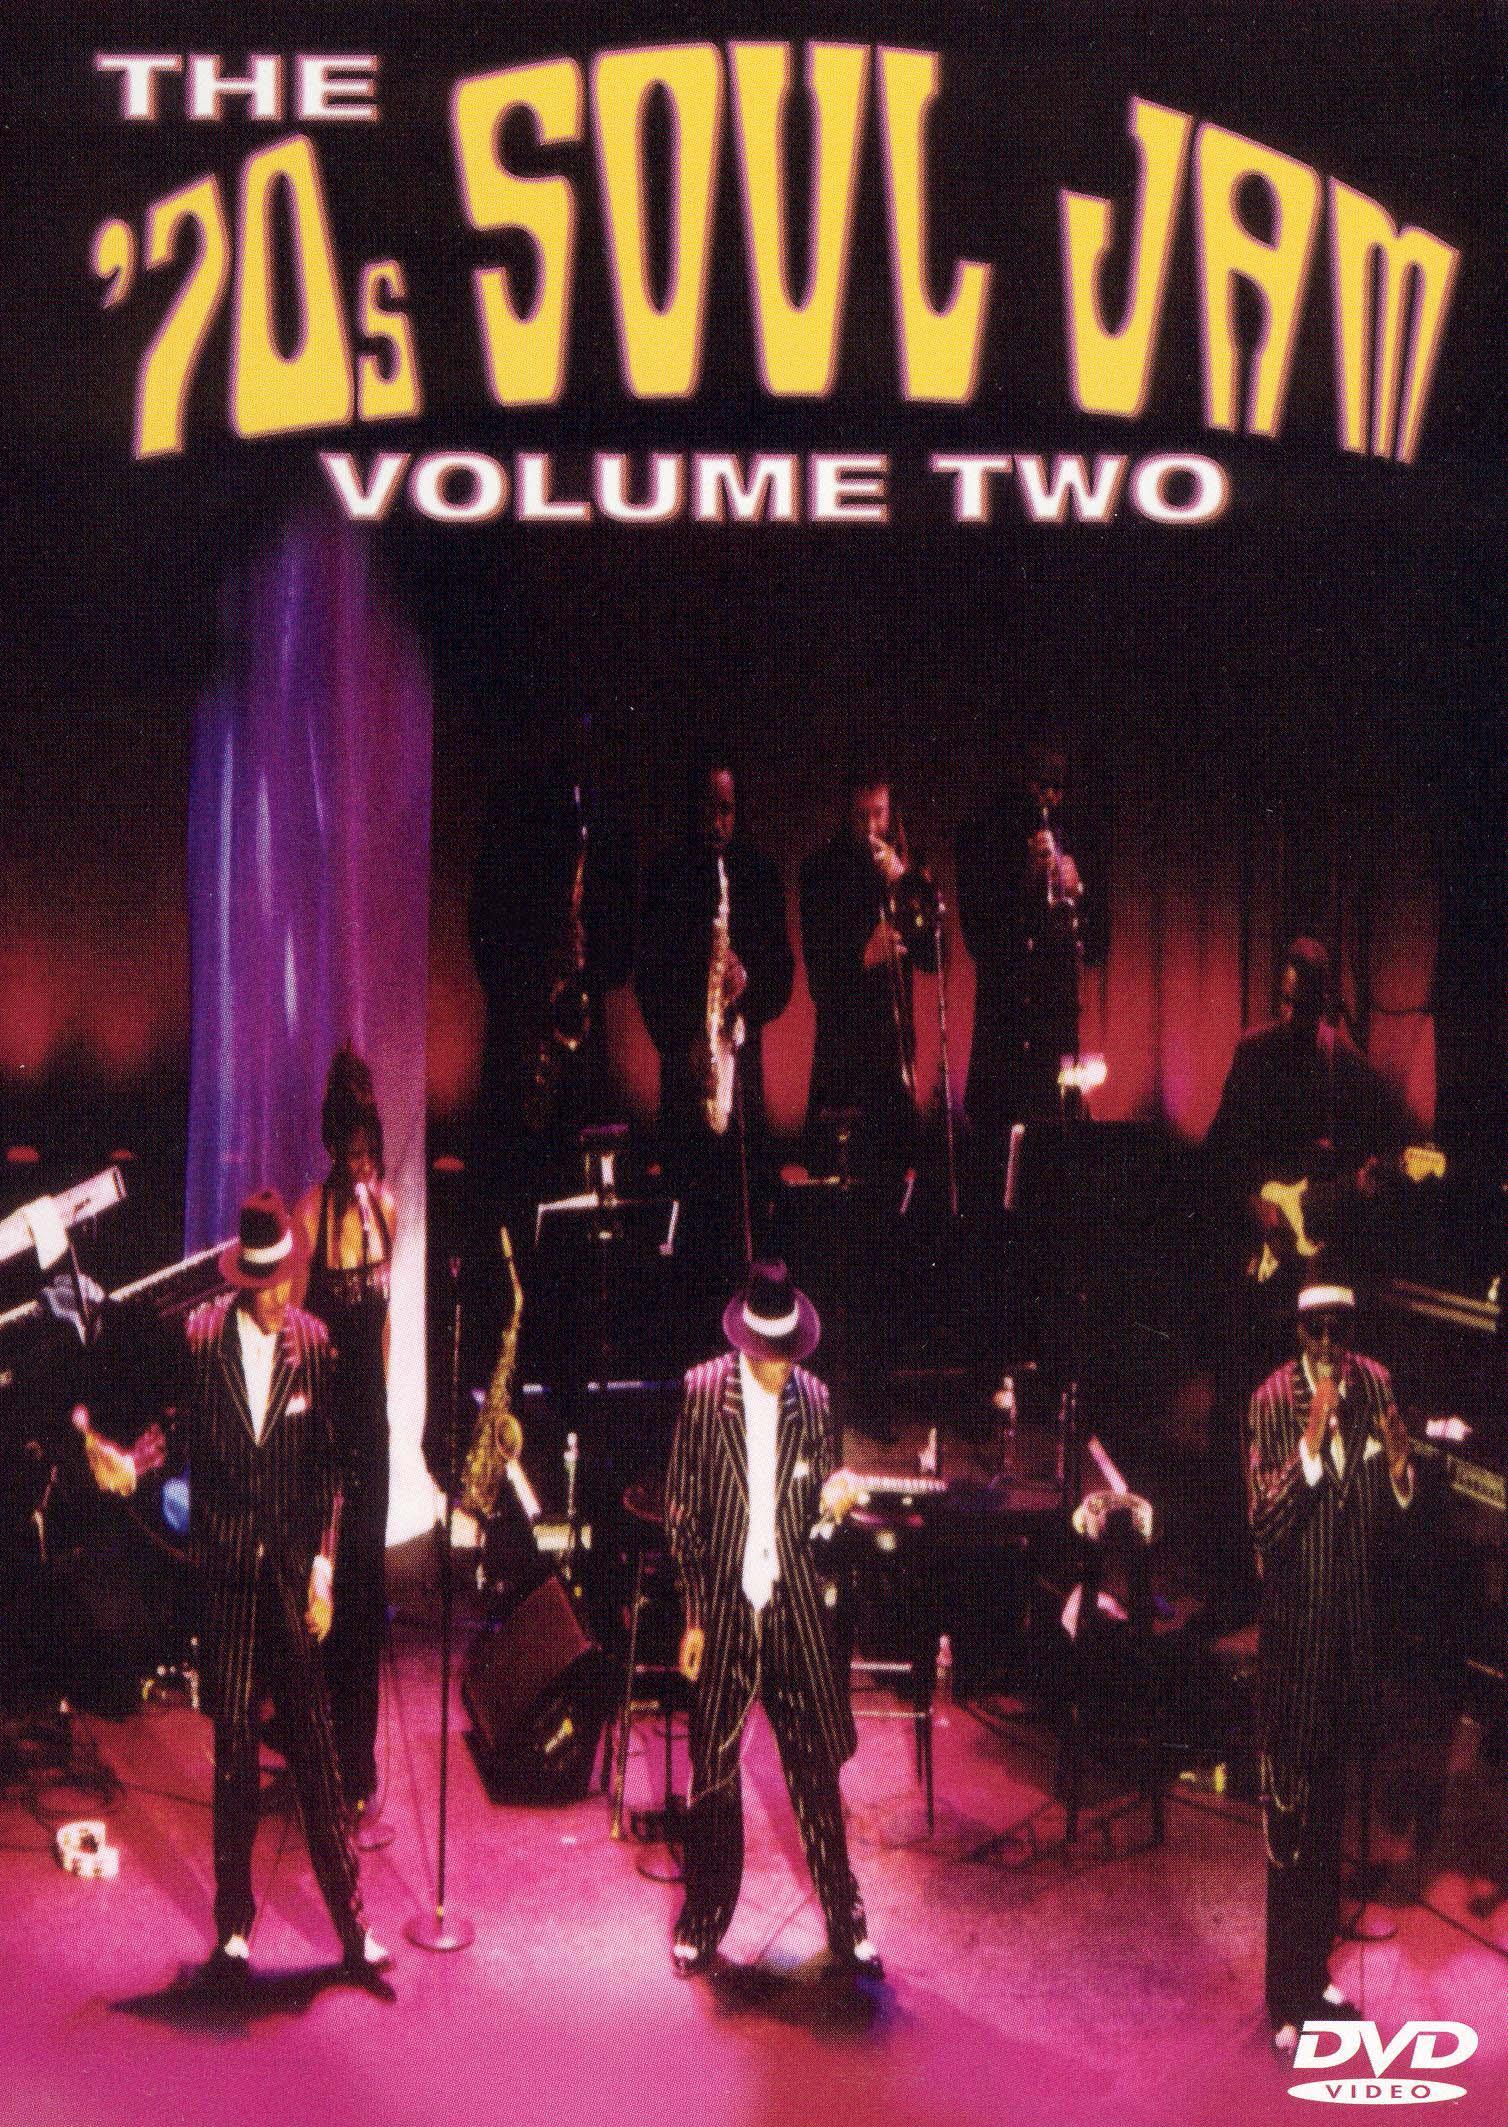 The '70s Soul Jam, Vol. 2